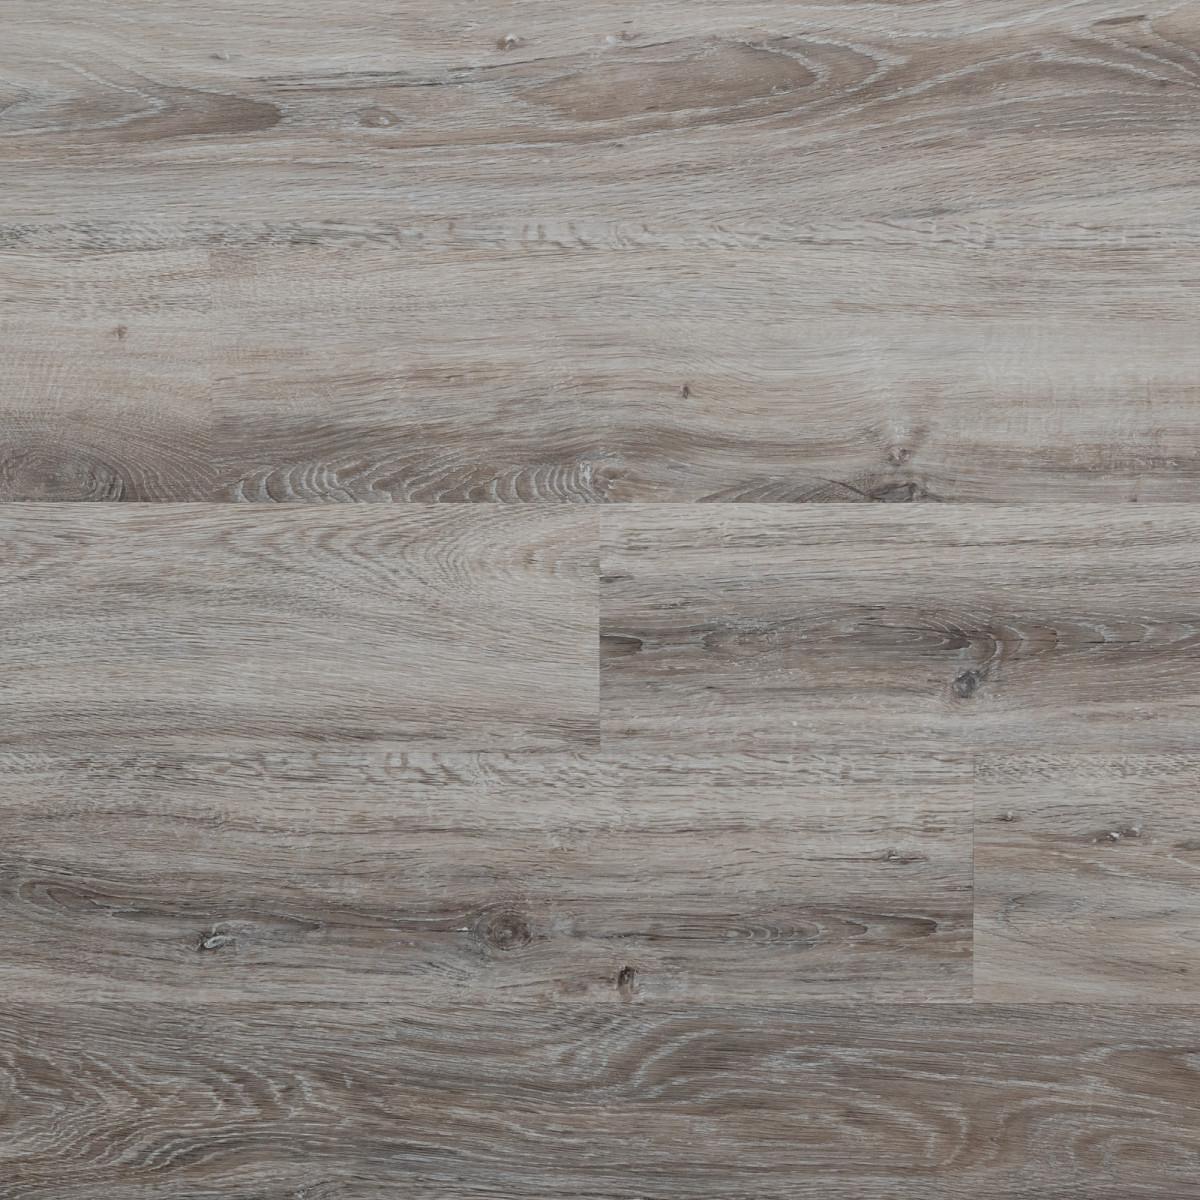 ПВХ плитка Grey Natural 21 класс толщина 1.5 мм 2.23 м²